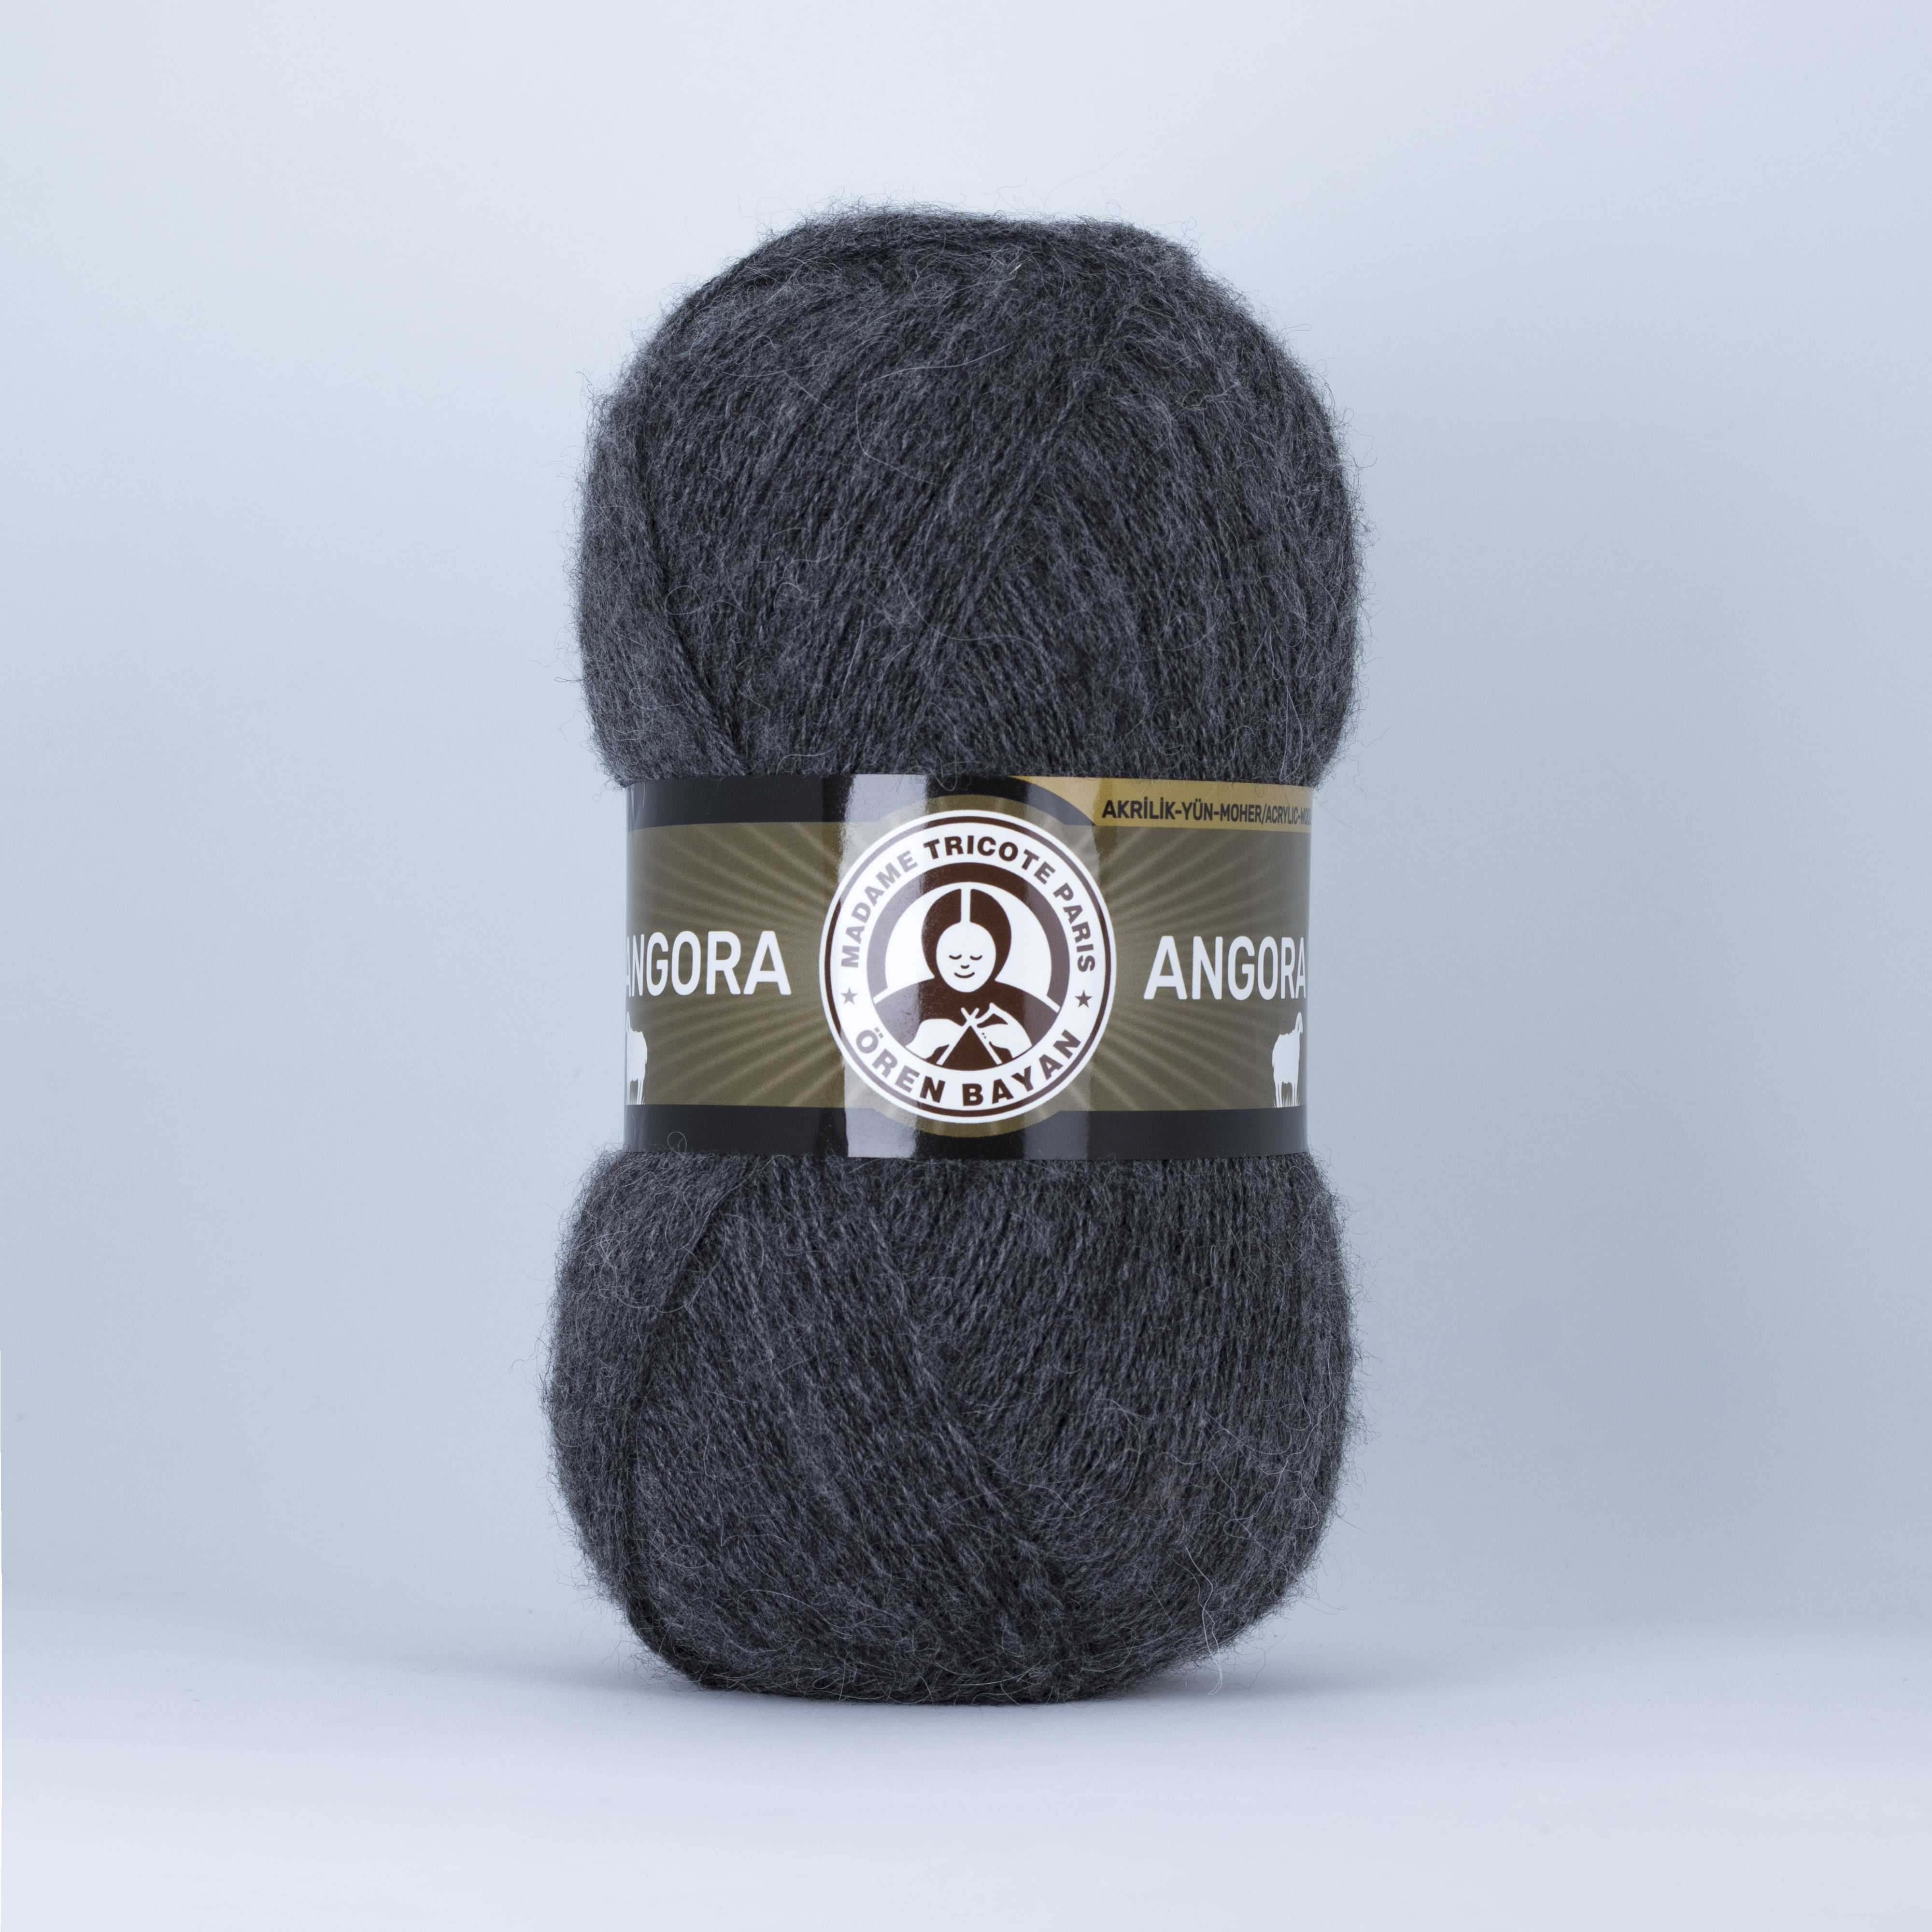 4 шт. 400 г/лот 4 шарика Сделай Сам тонкая мягкая мухера Ангорская шерстяная пряжа окрашенный шарф одеяло ручная вязка меланжевая пряжа